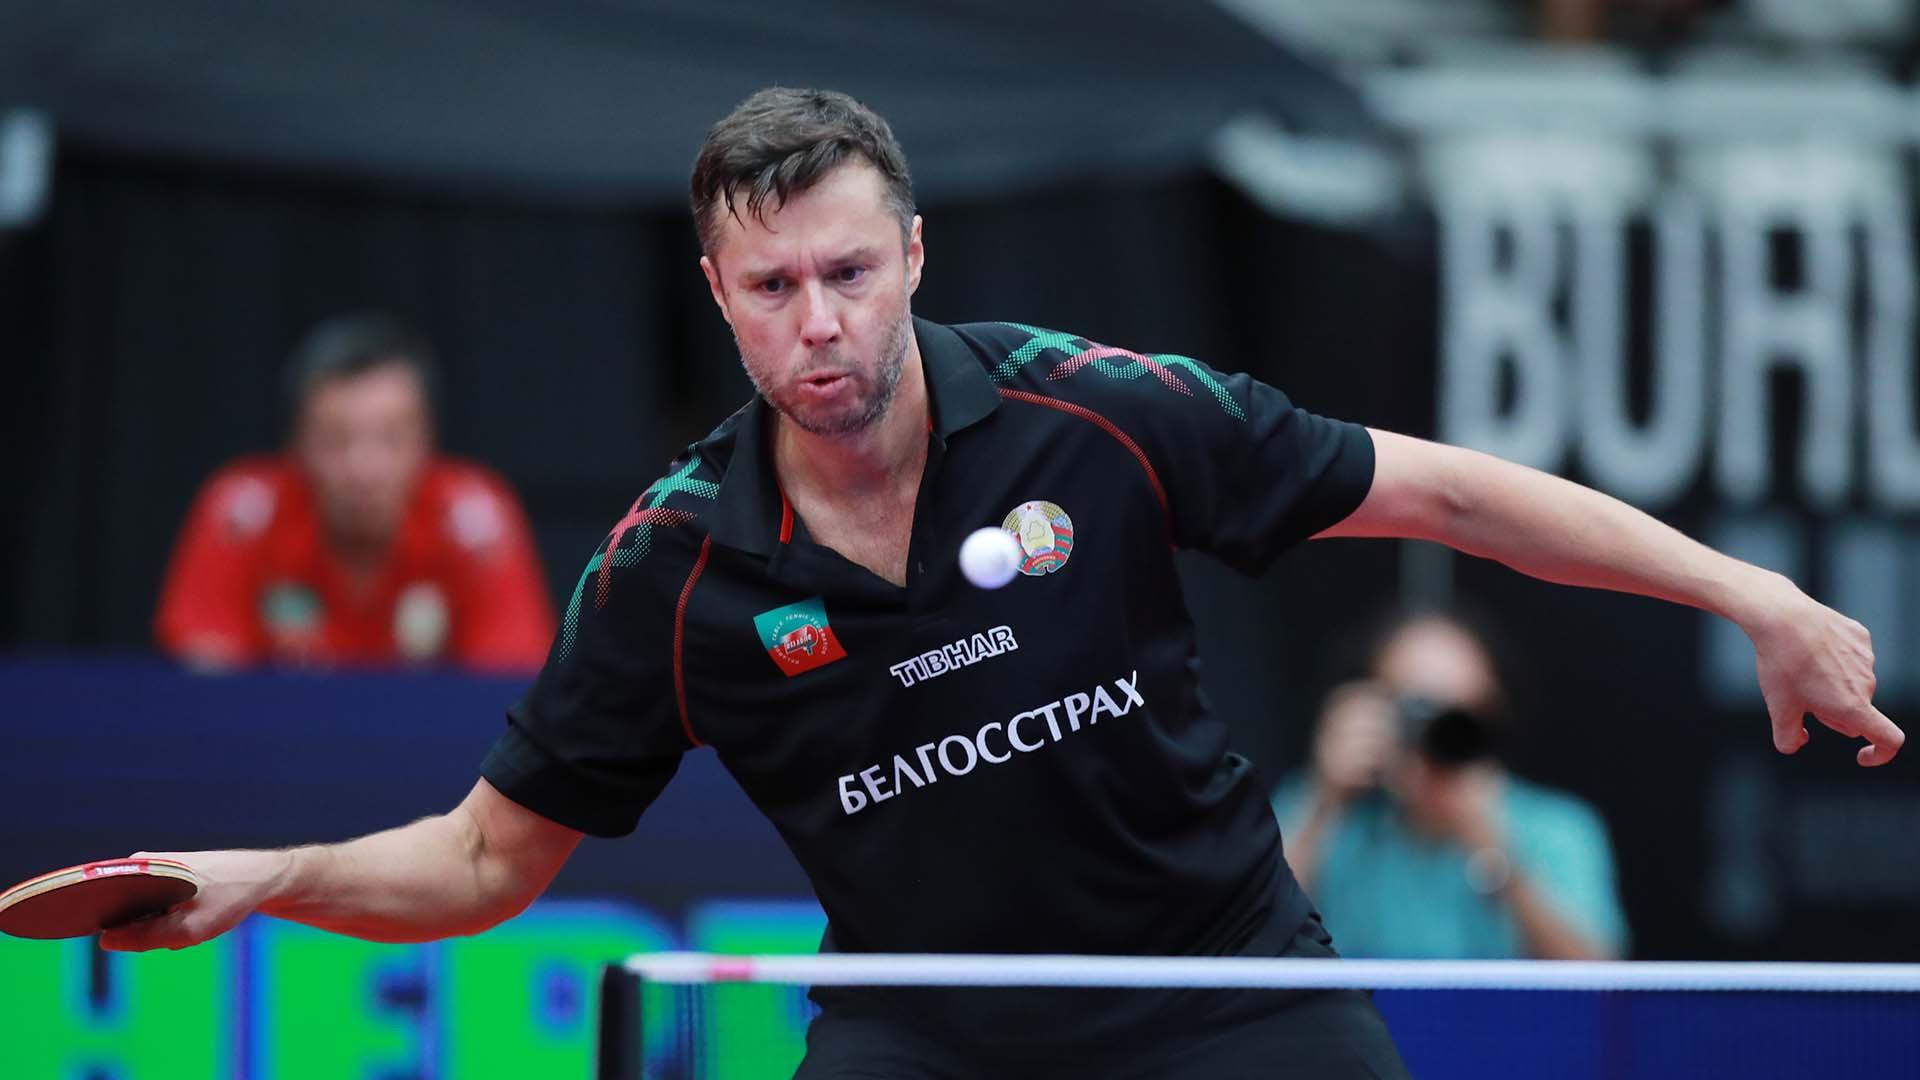 Twenty years after winning title, Samsonov beats ITTF European Championships second seed Ovtcharov